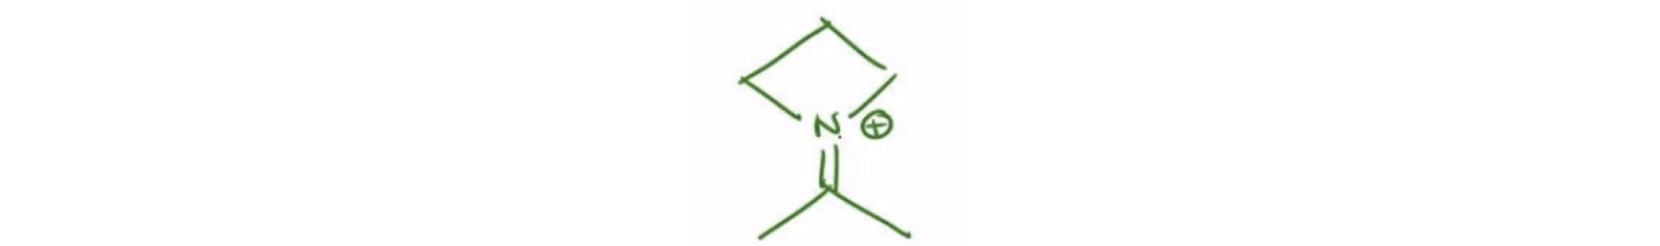 Iminium-Cation-of-an-Enamine